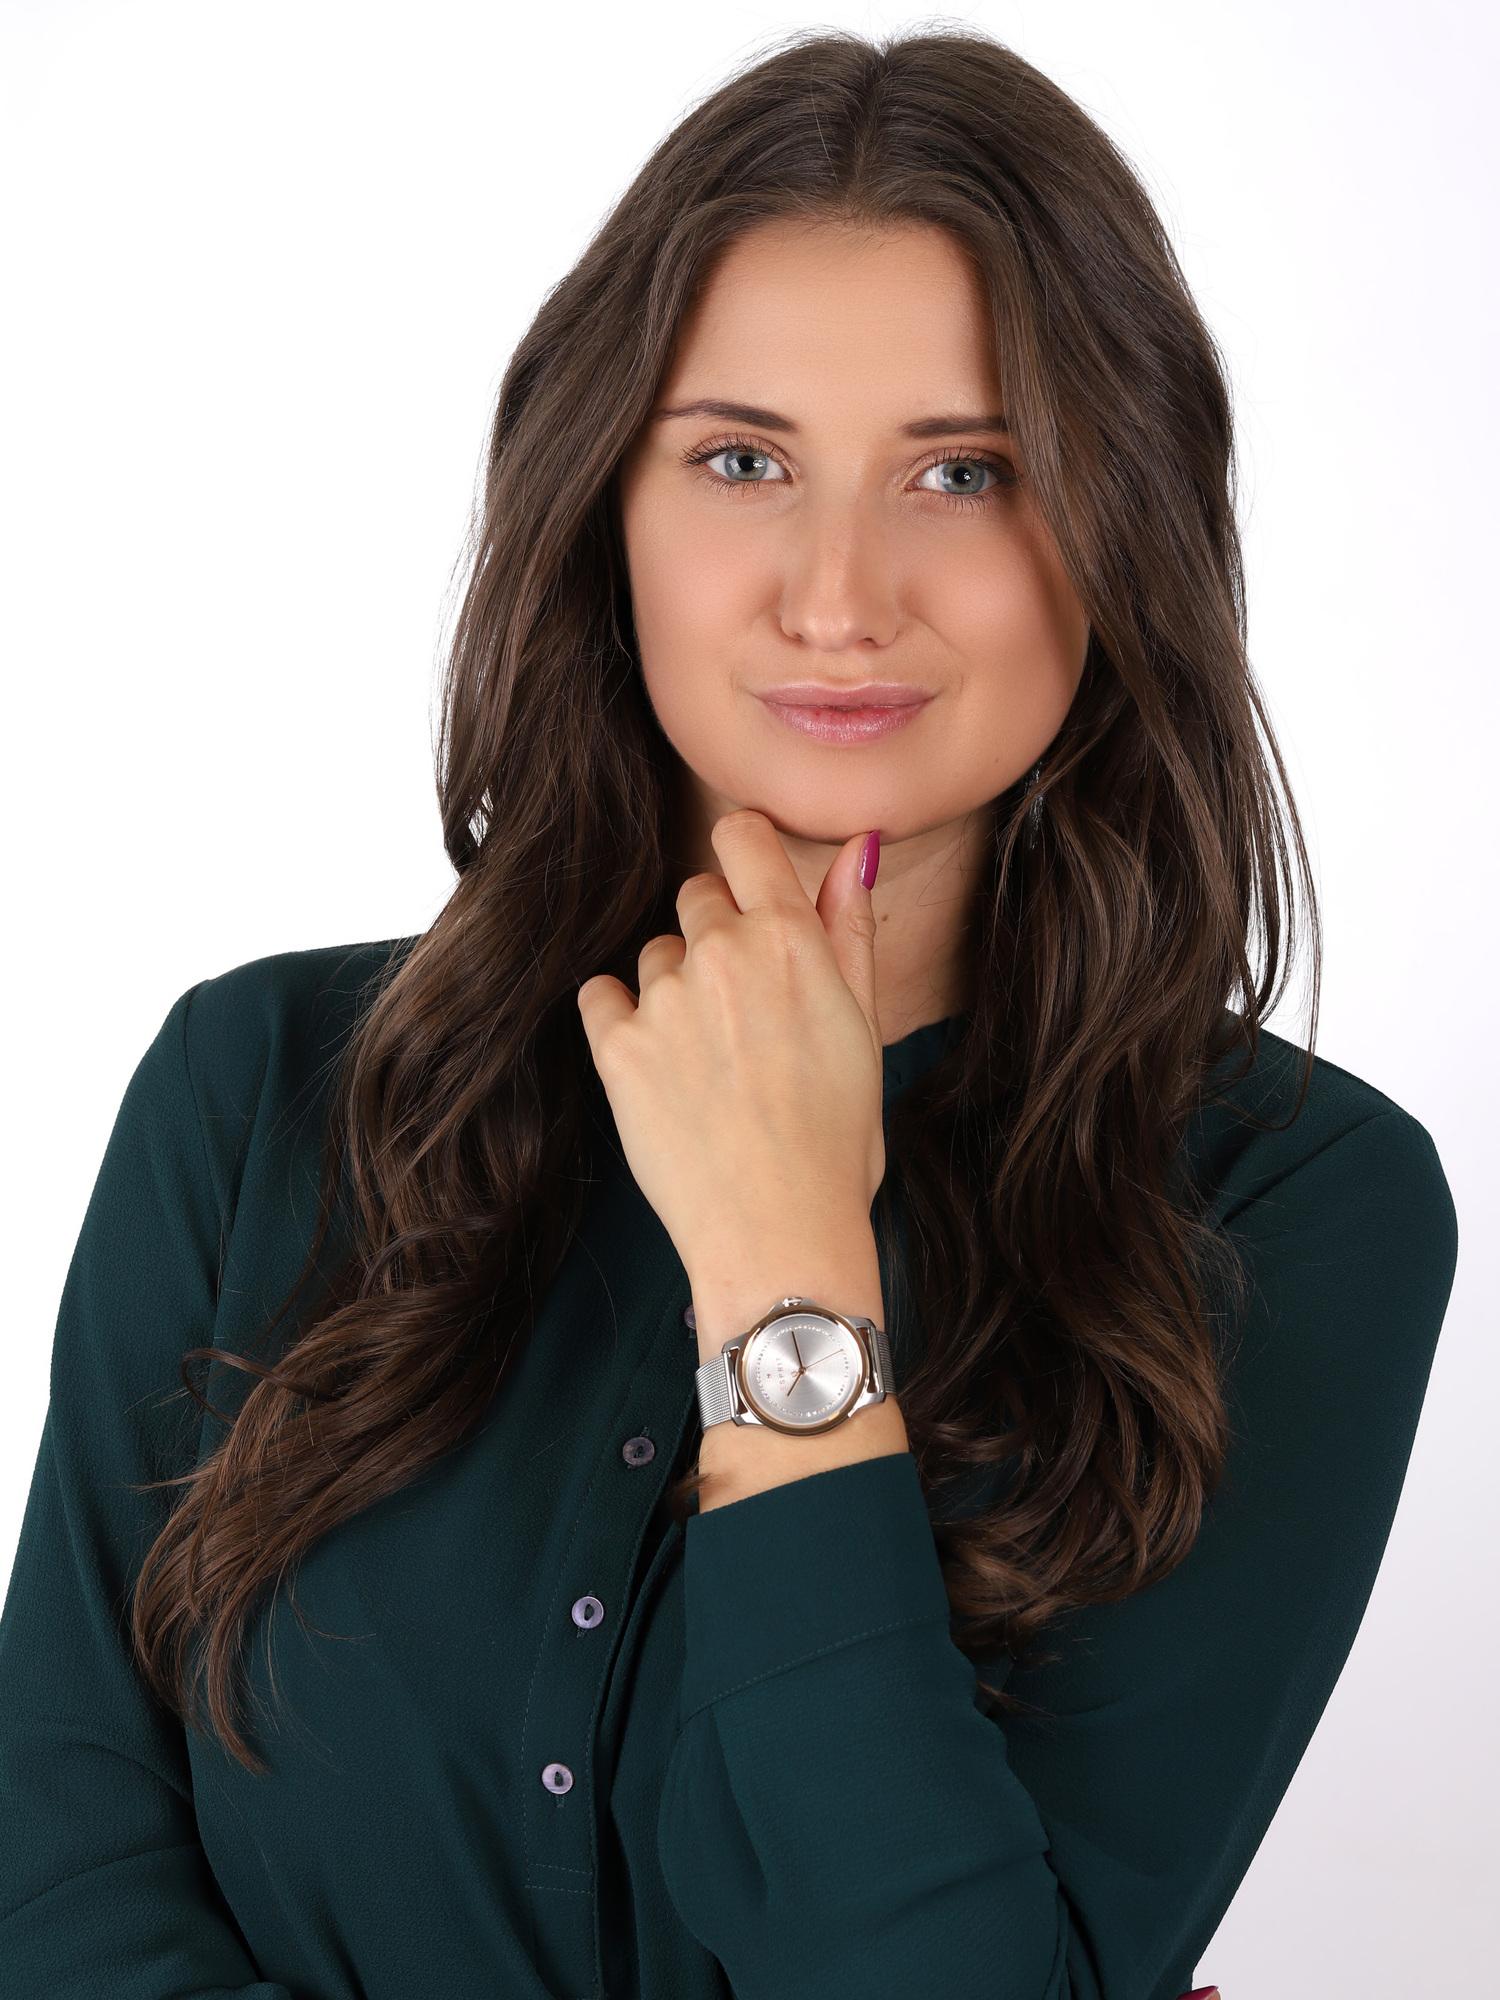 zegarek Esprit ES1L147M0115 kwarcowy damski Damskie